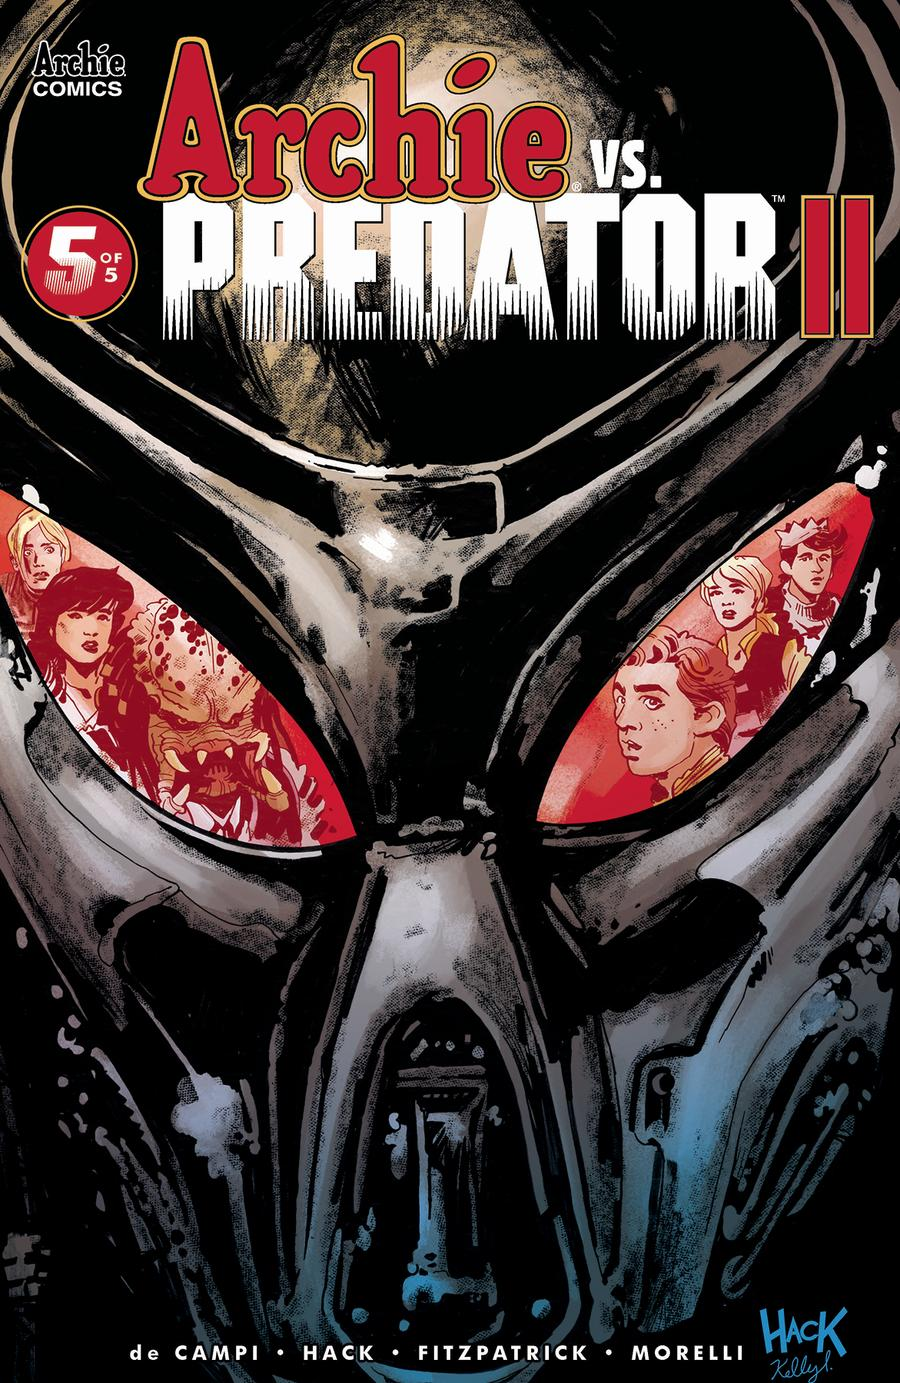 Archie vs Predator II #5 Cover A Regular Robert Hack & Kelly Fitzpatrick Cover